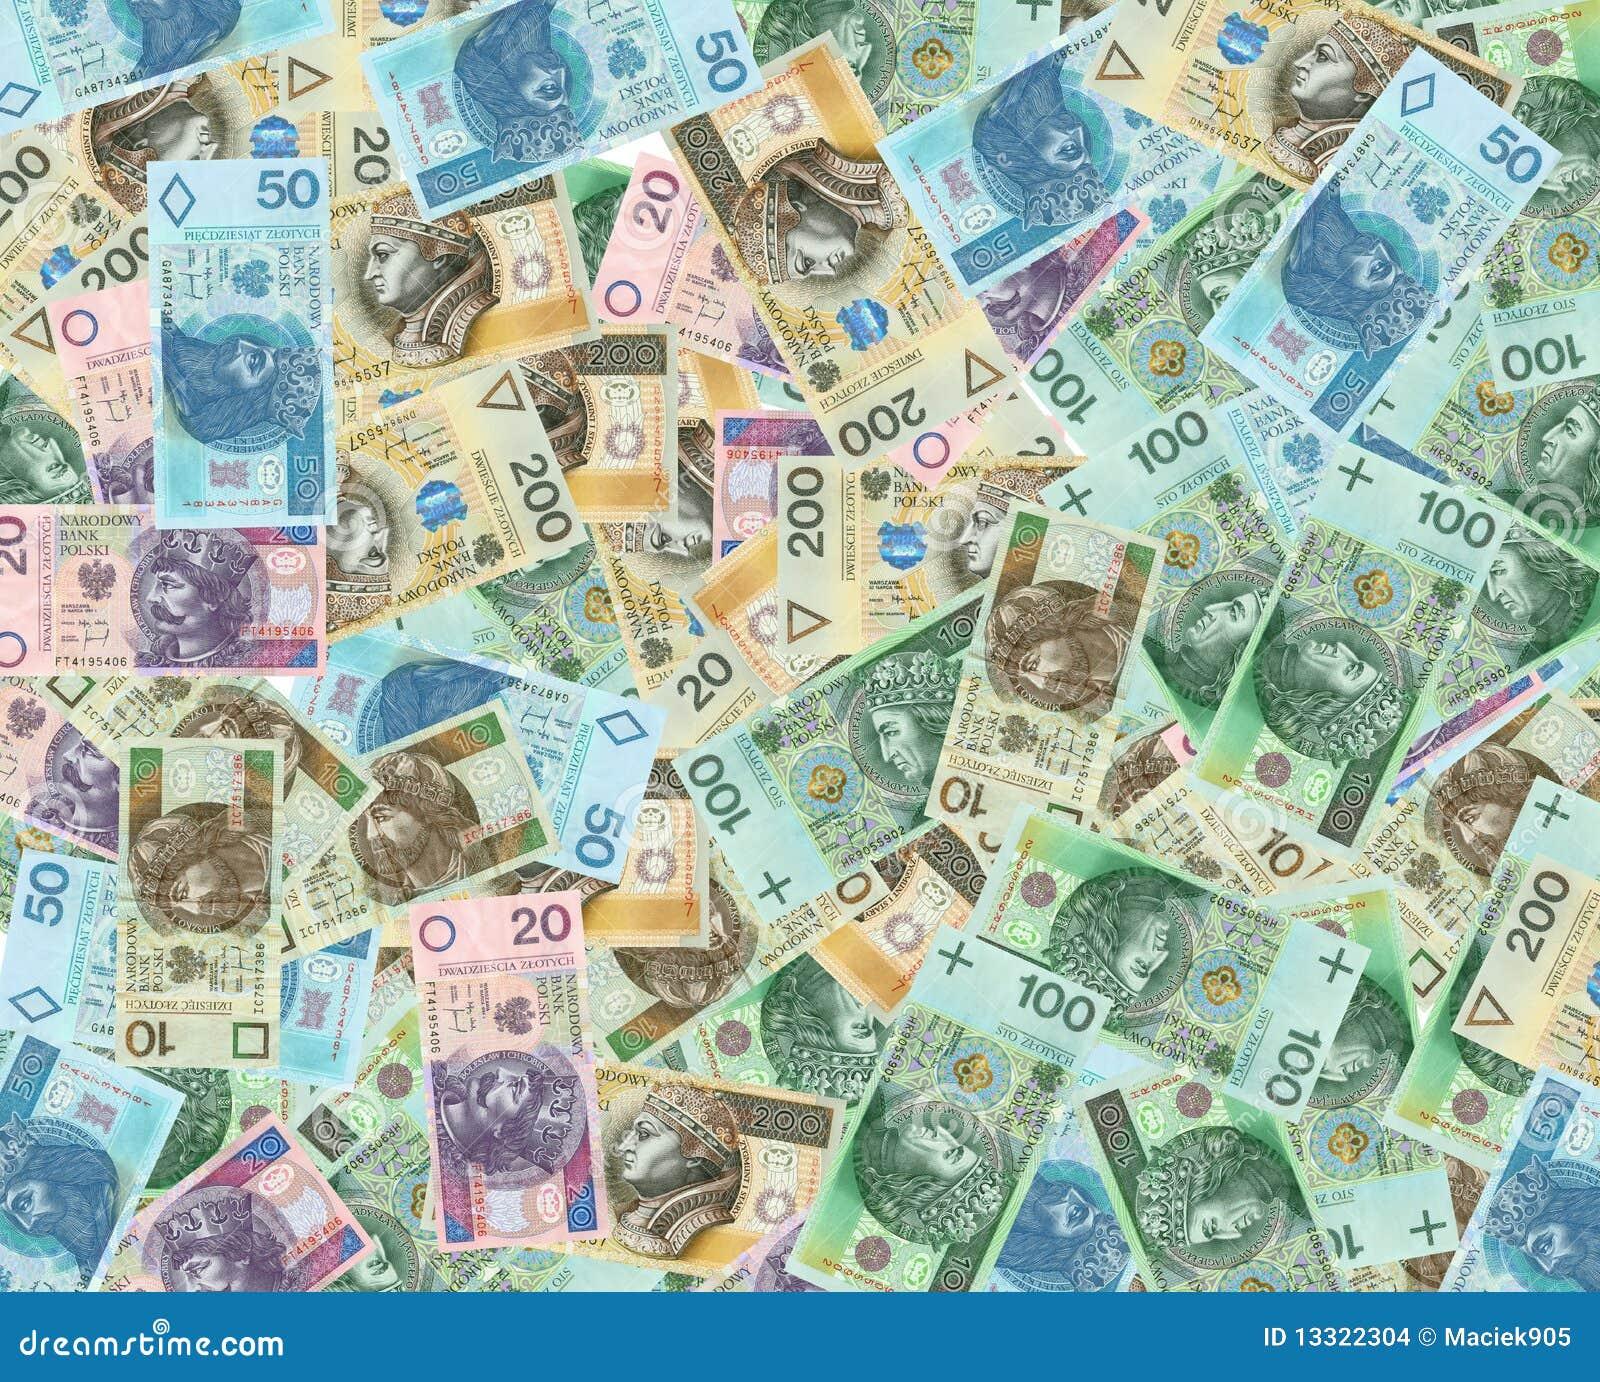 Polish money bank notes